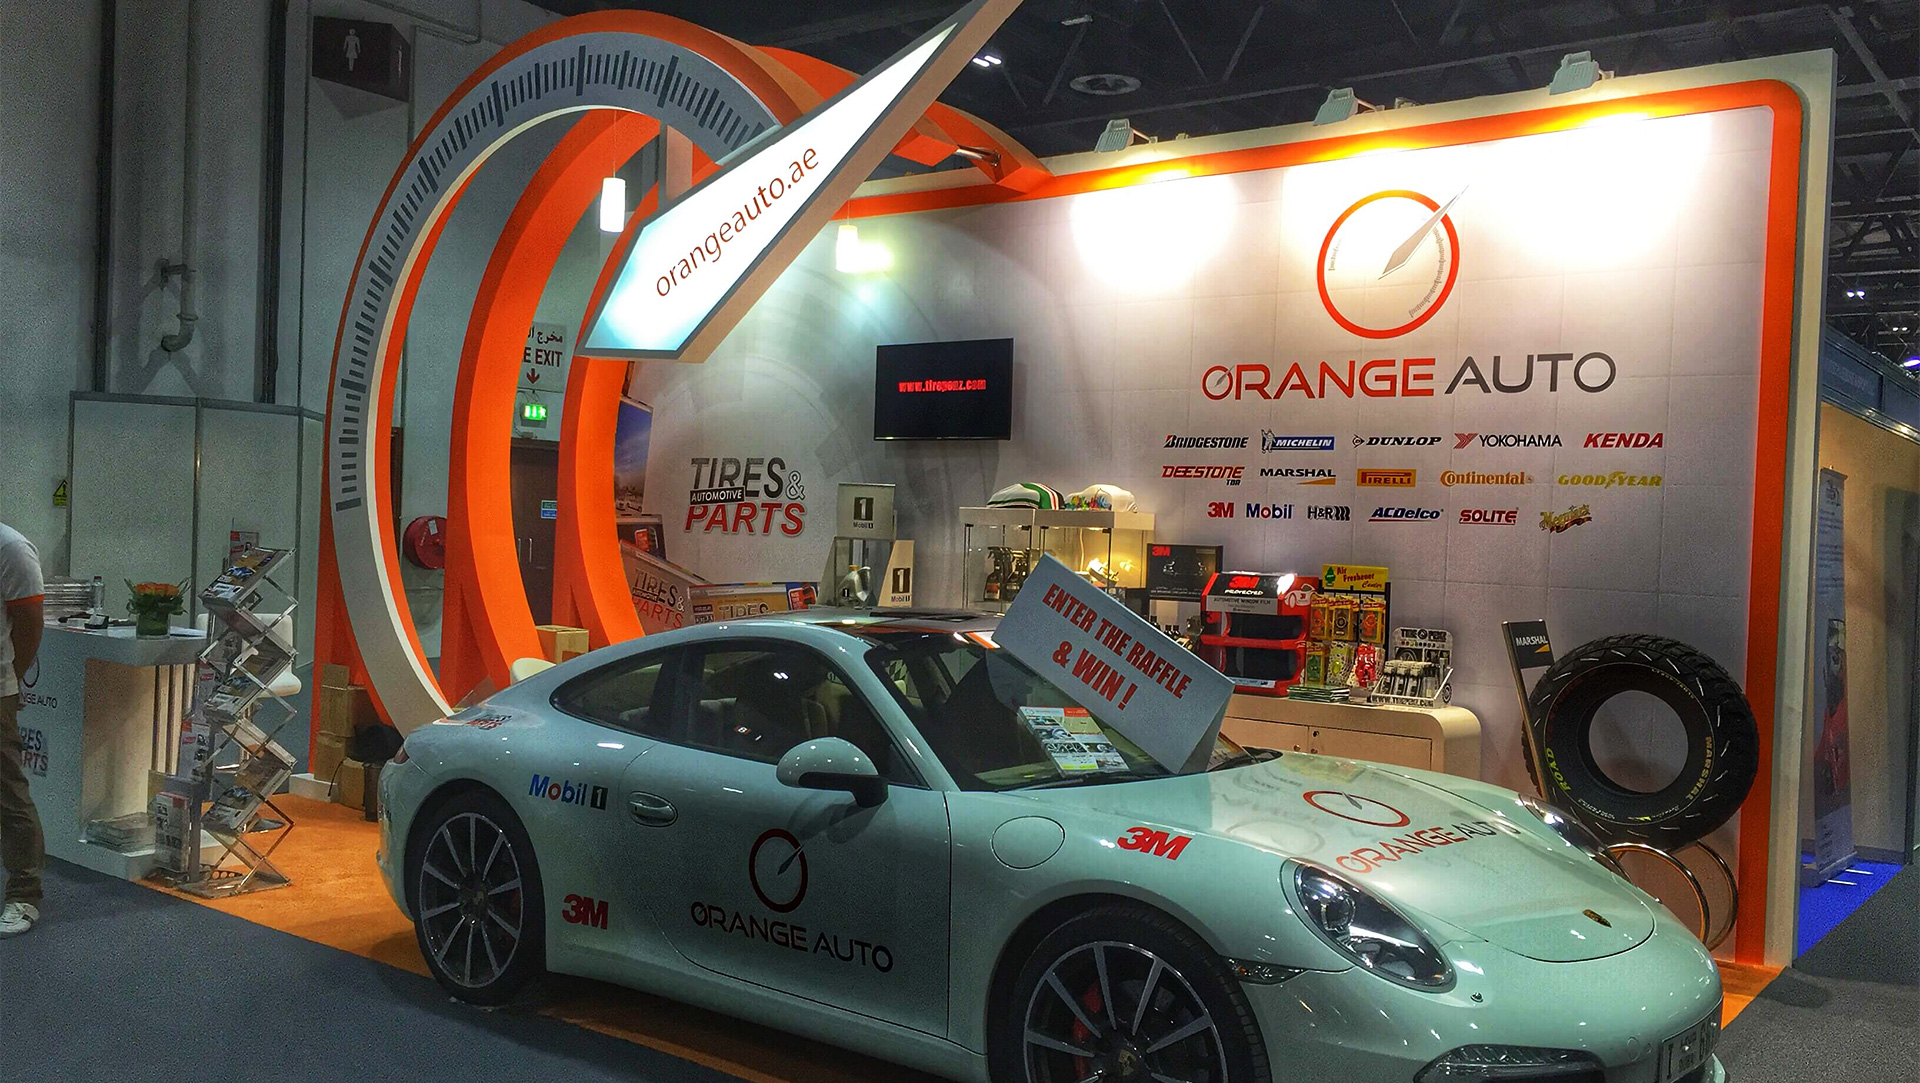 orange auto at dubai International motorshow 2015